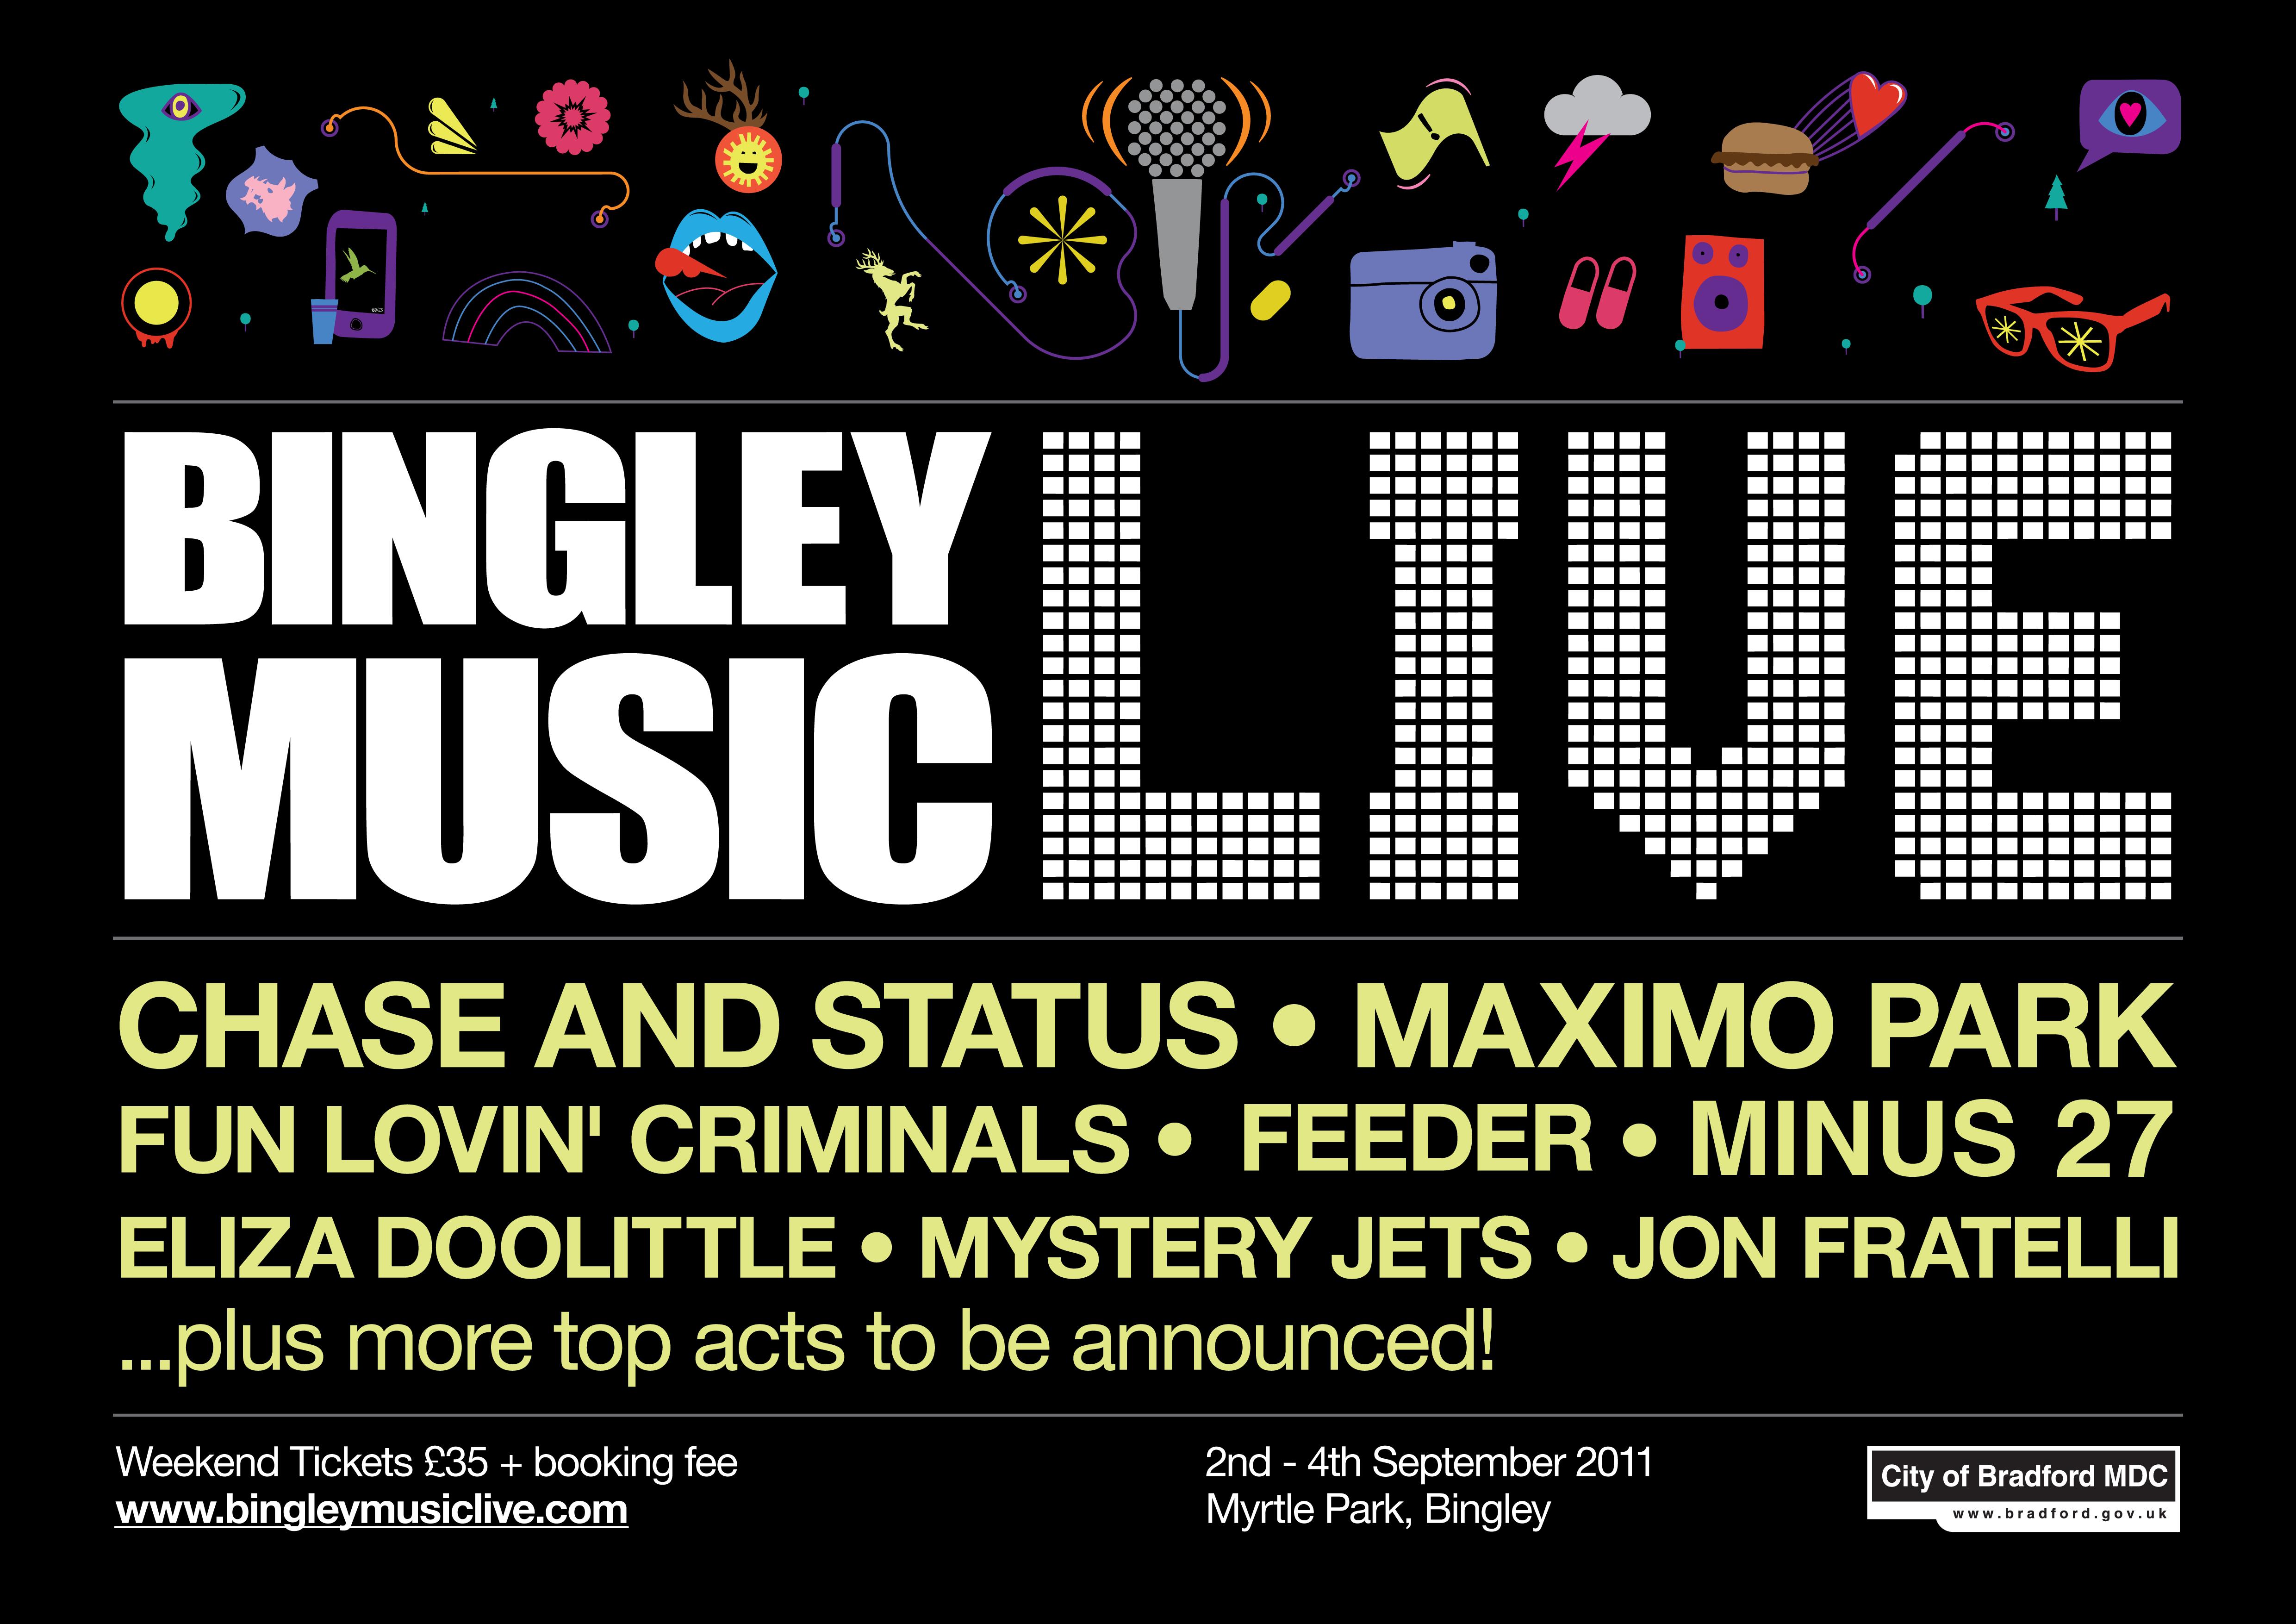 Minus 27 Bingley Live